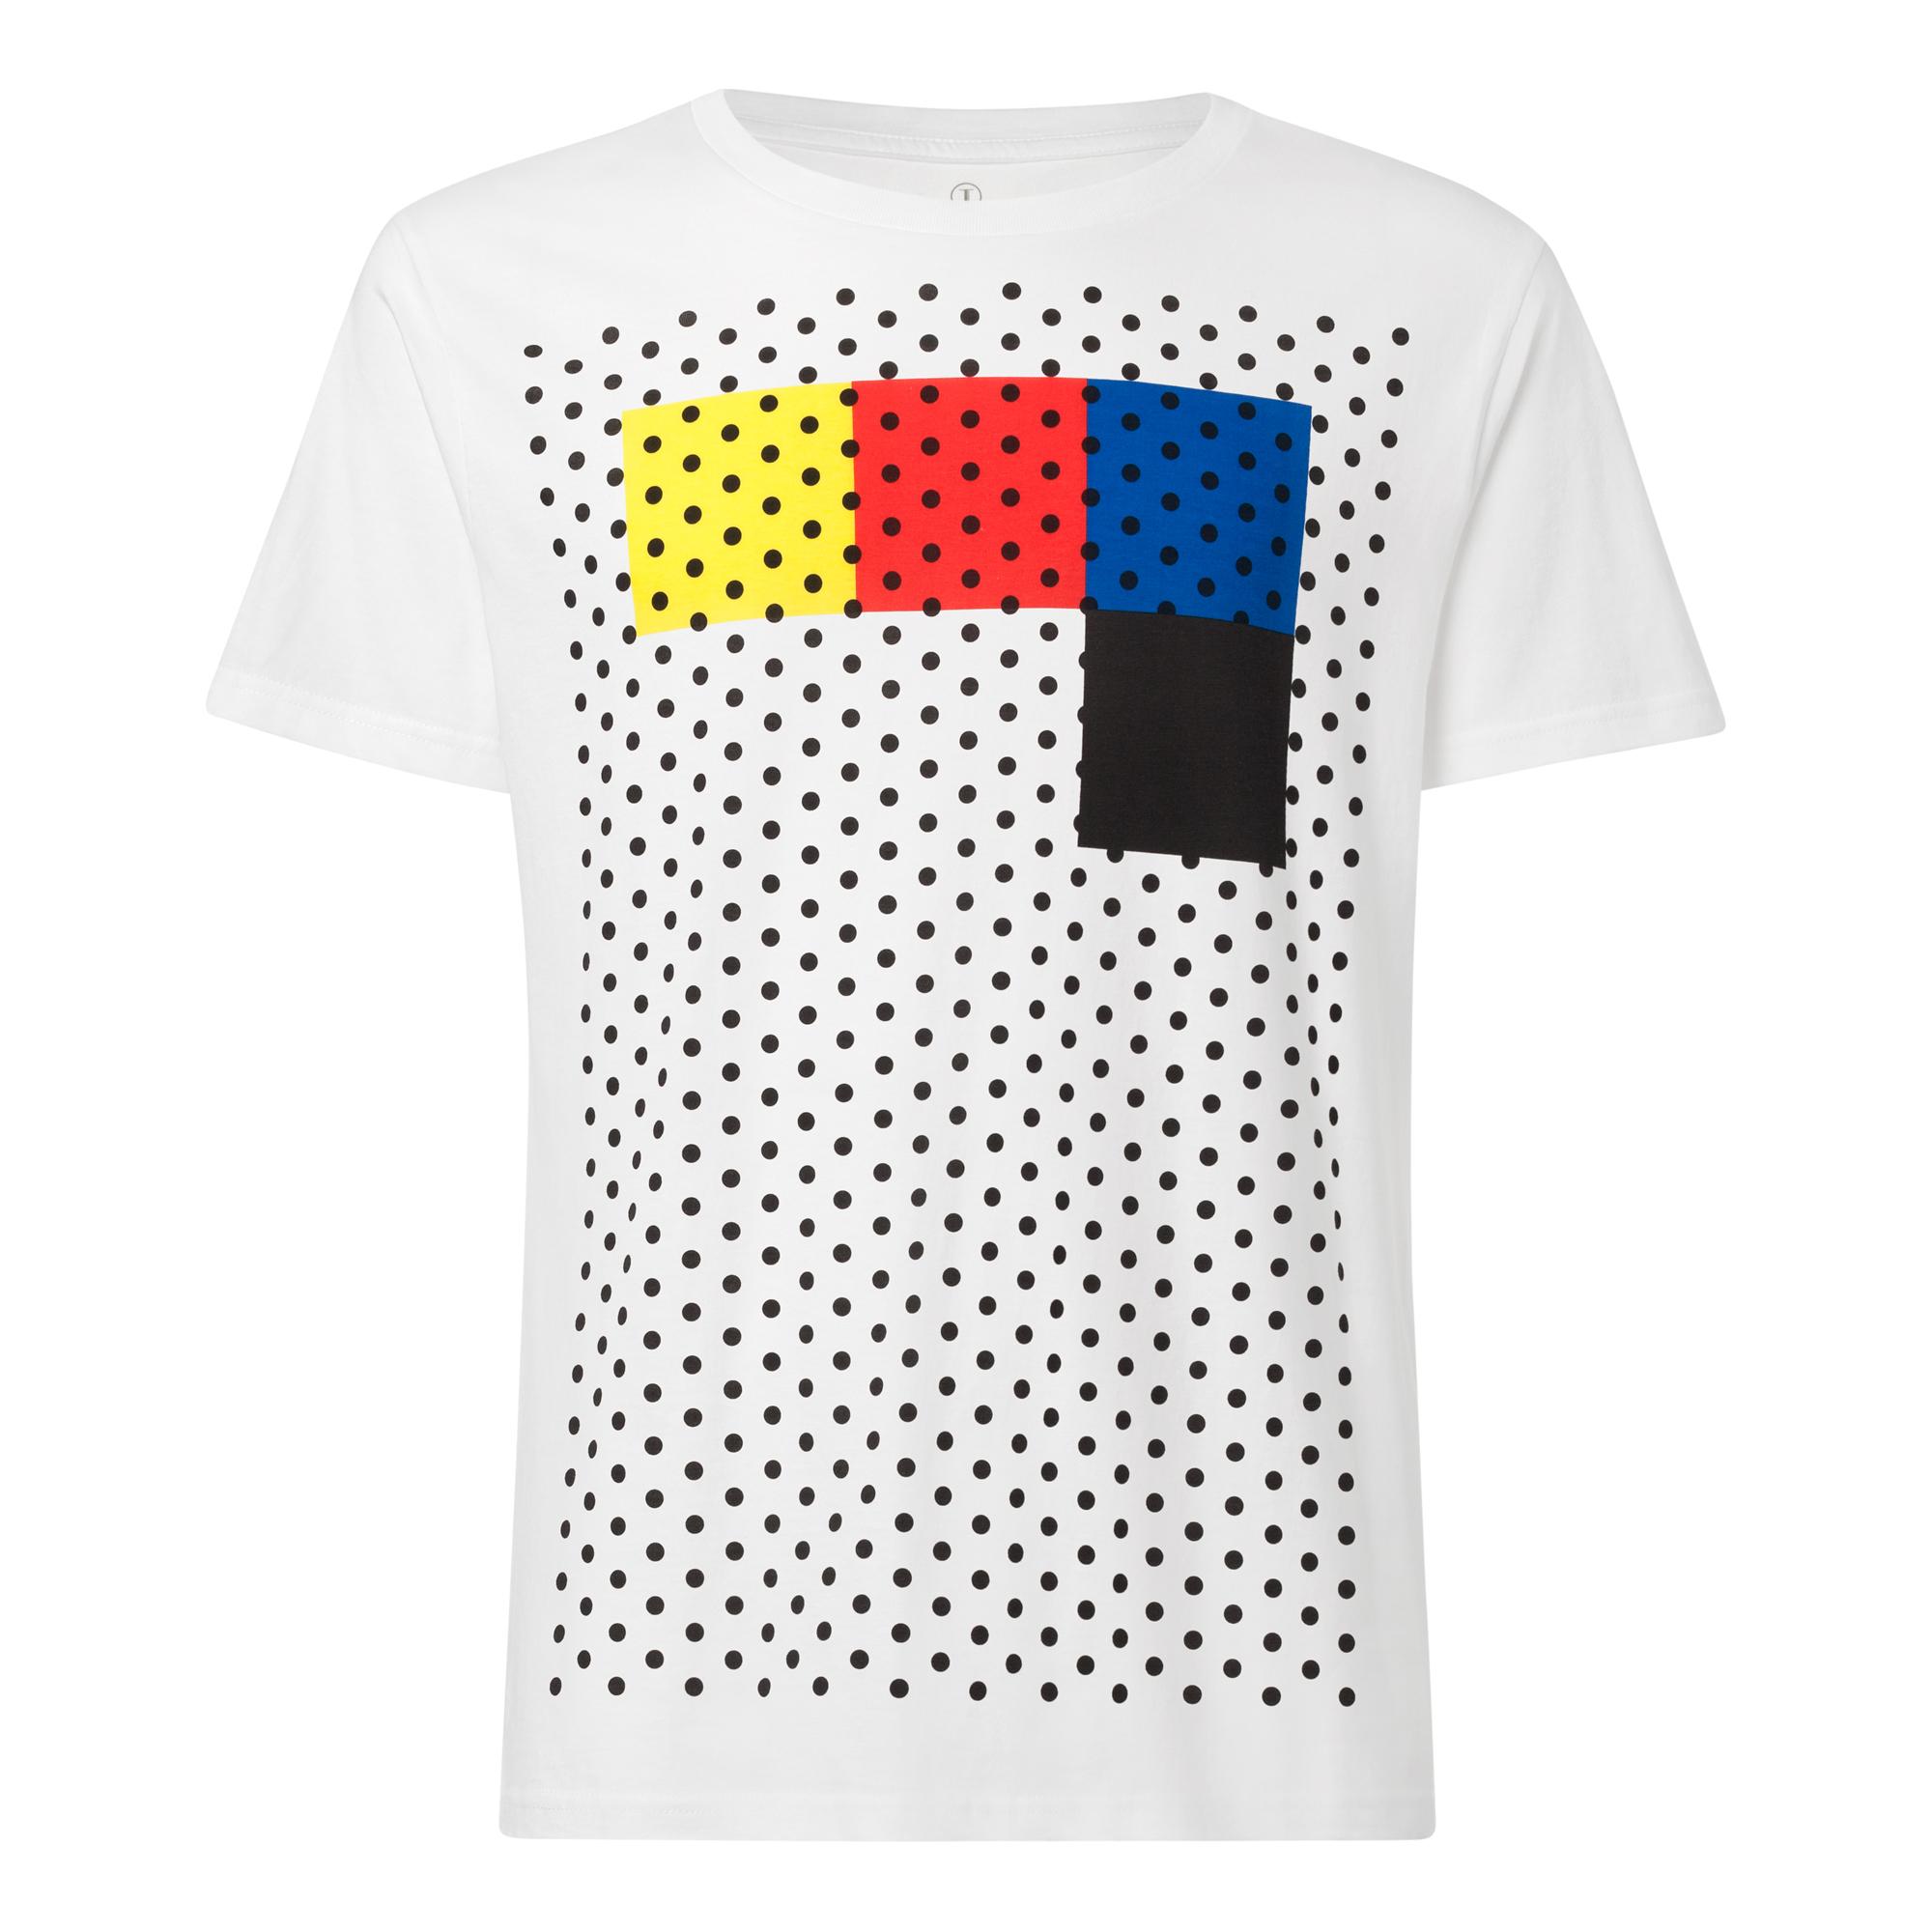 Rasterblock T-Shirt white GOTS & Fairtrade